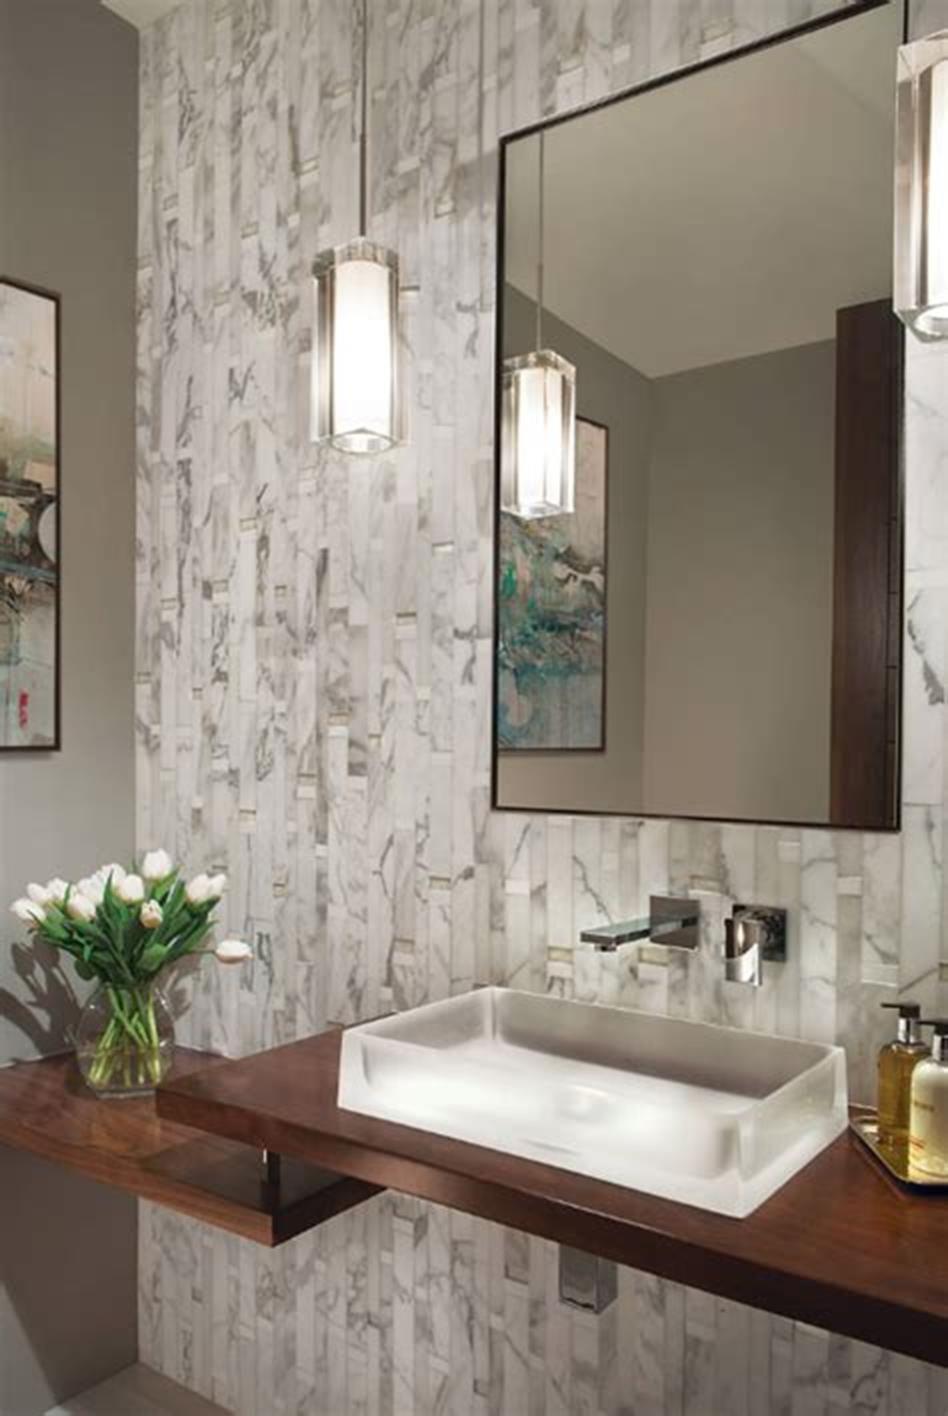 34 Best Half Bathroom Design And Decorating Ideas On A Budget In 2020 Powder Room Ideas Half Baths Contemporary Bathroom Faucets Small Half Bathrooms